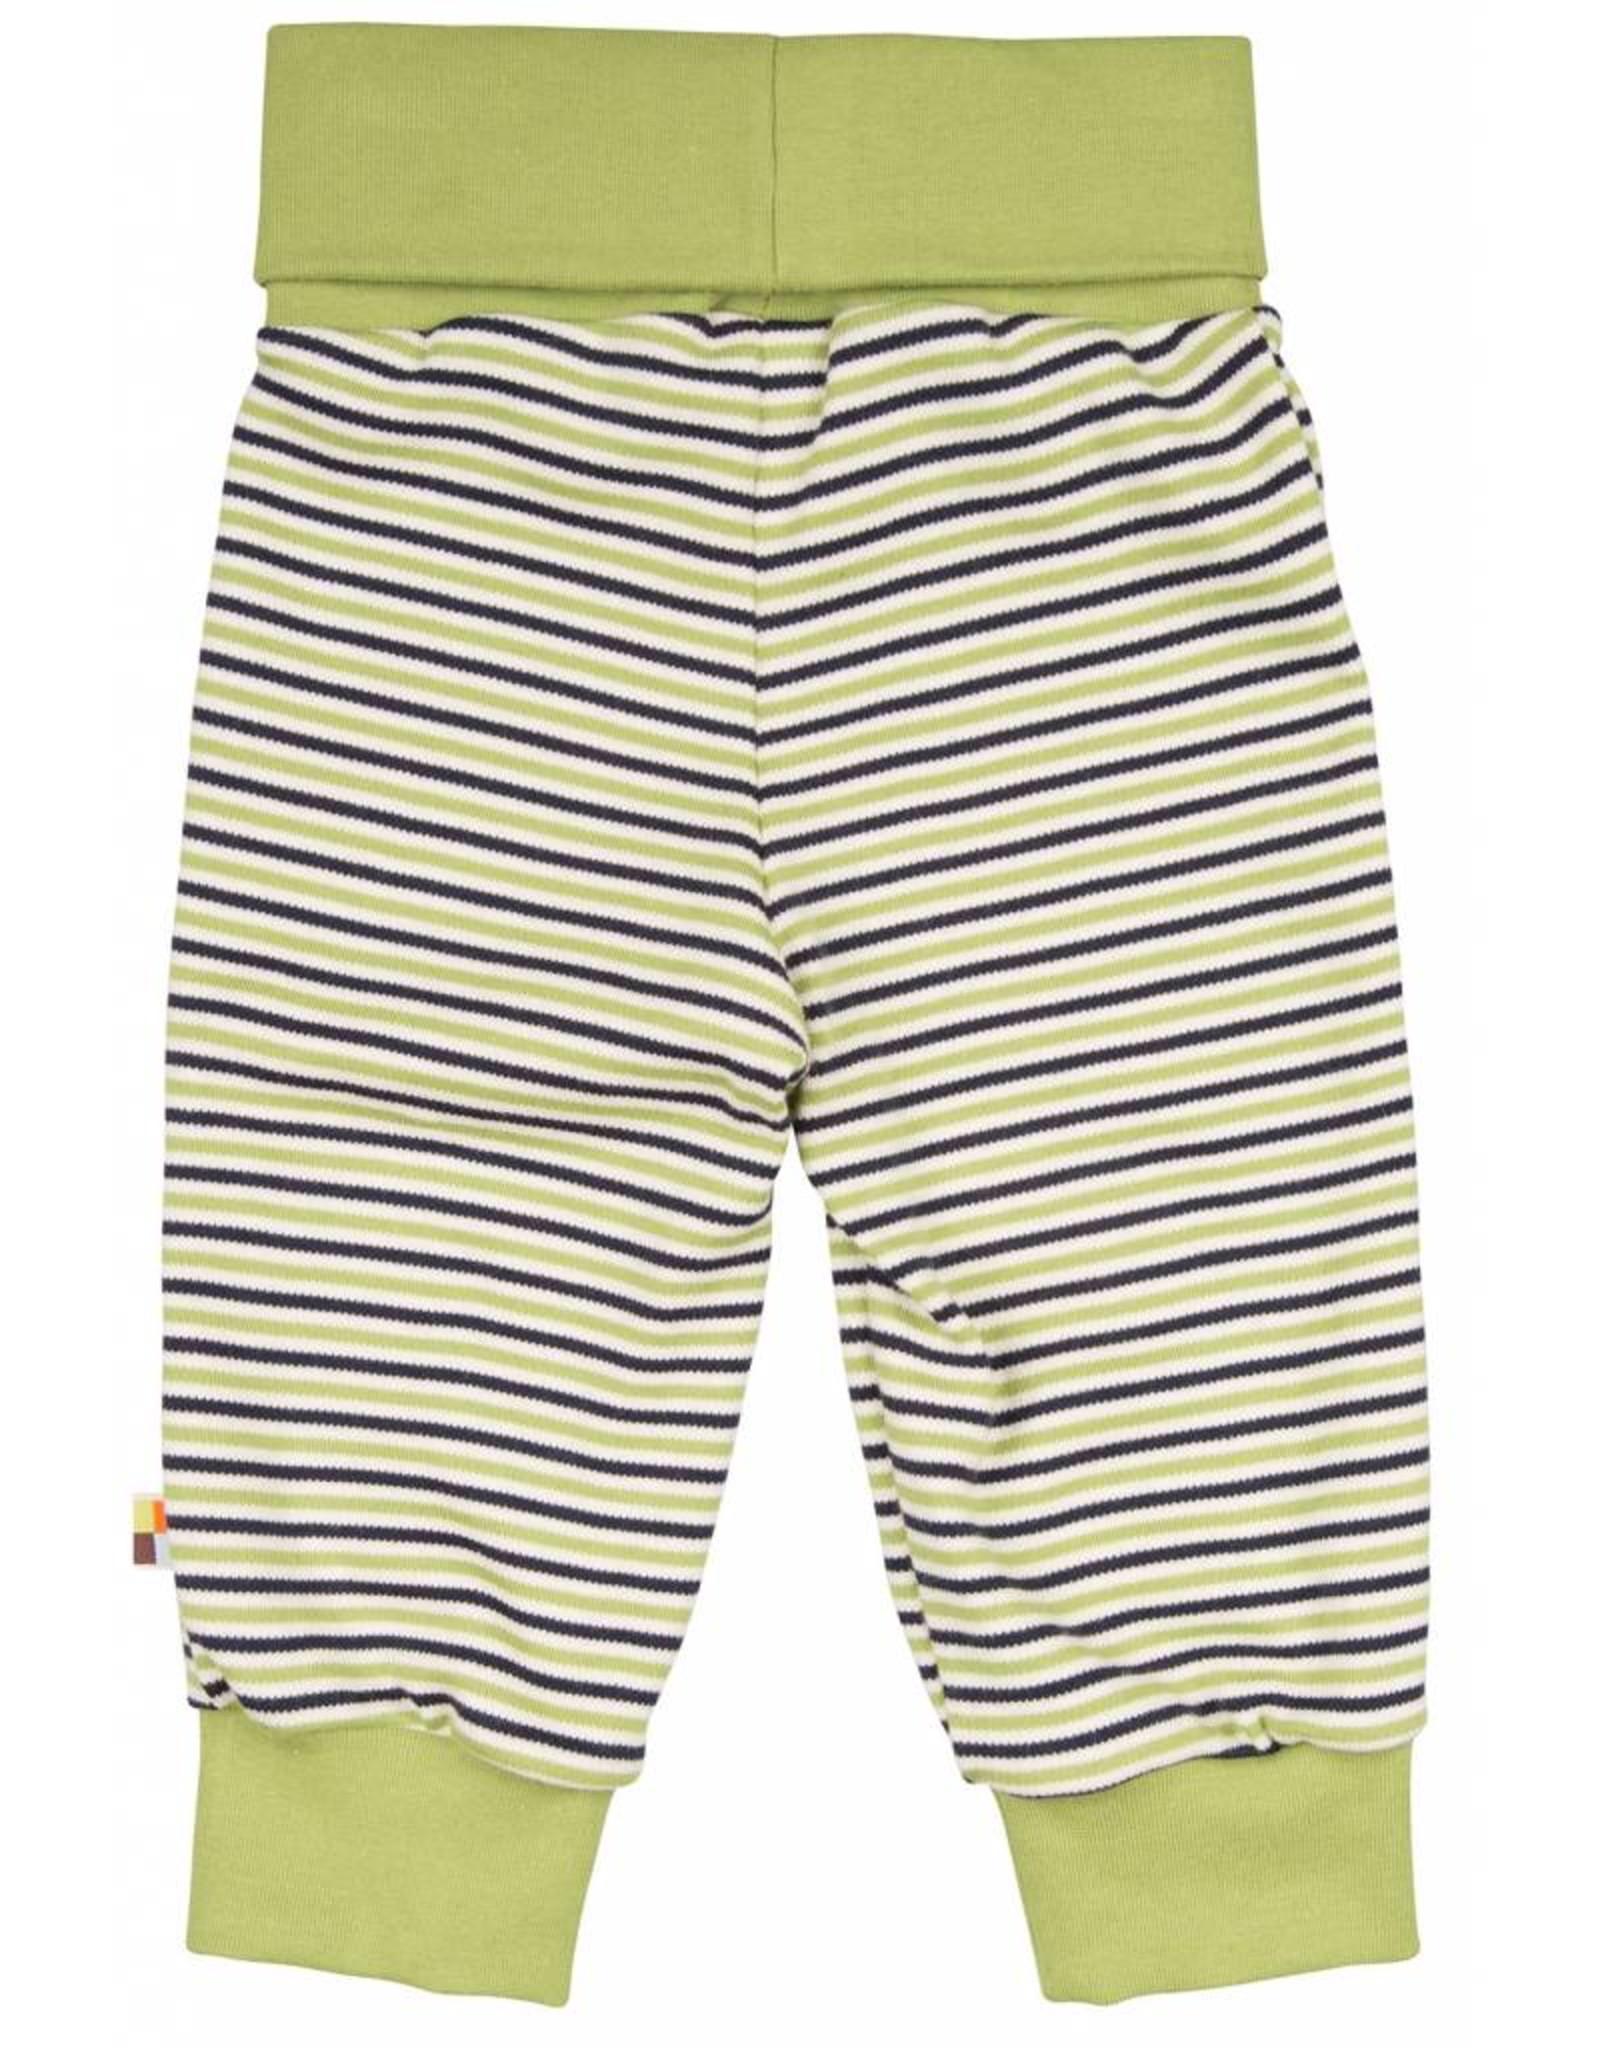 loud+proud Children's trousers - green striped